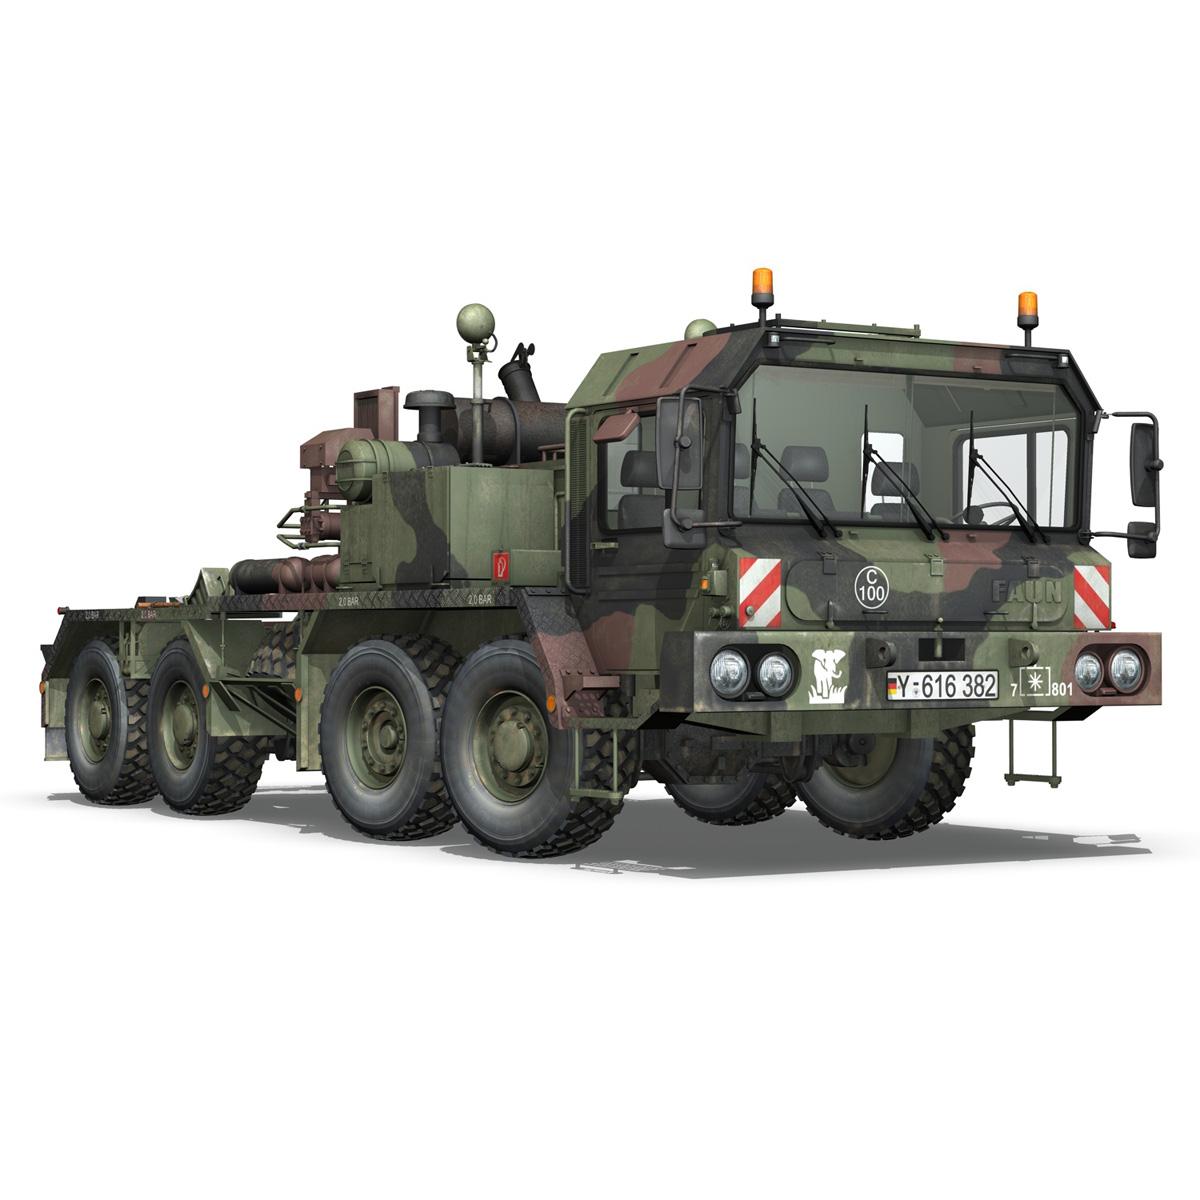 faun stl-56 transportues tank 3d model 3ds fbx c4d lwo obj 201913